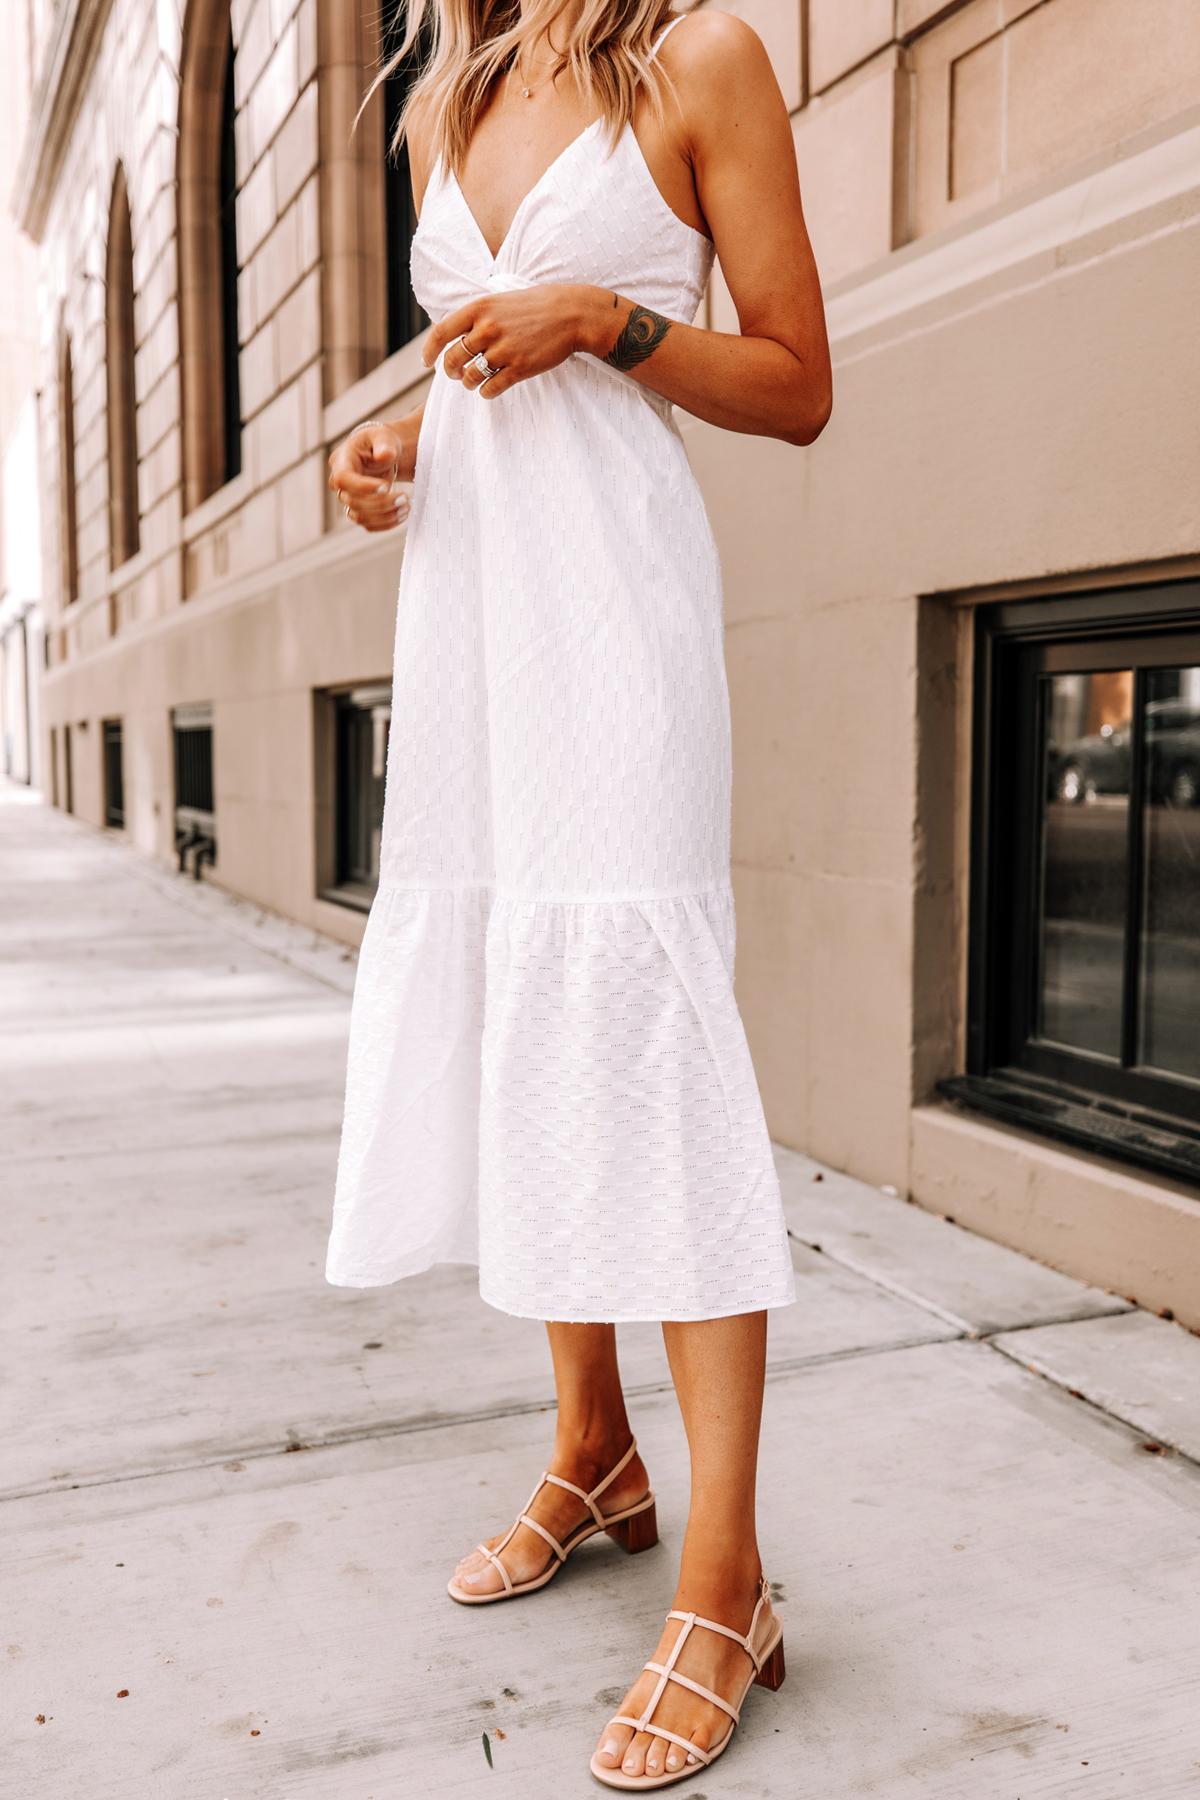 Fashion Jackson Wearing Banana Republic White Midi Dress Tan Sandals 1